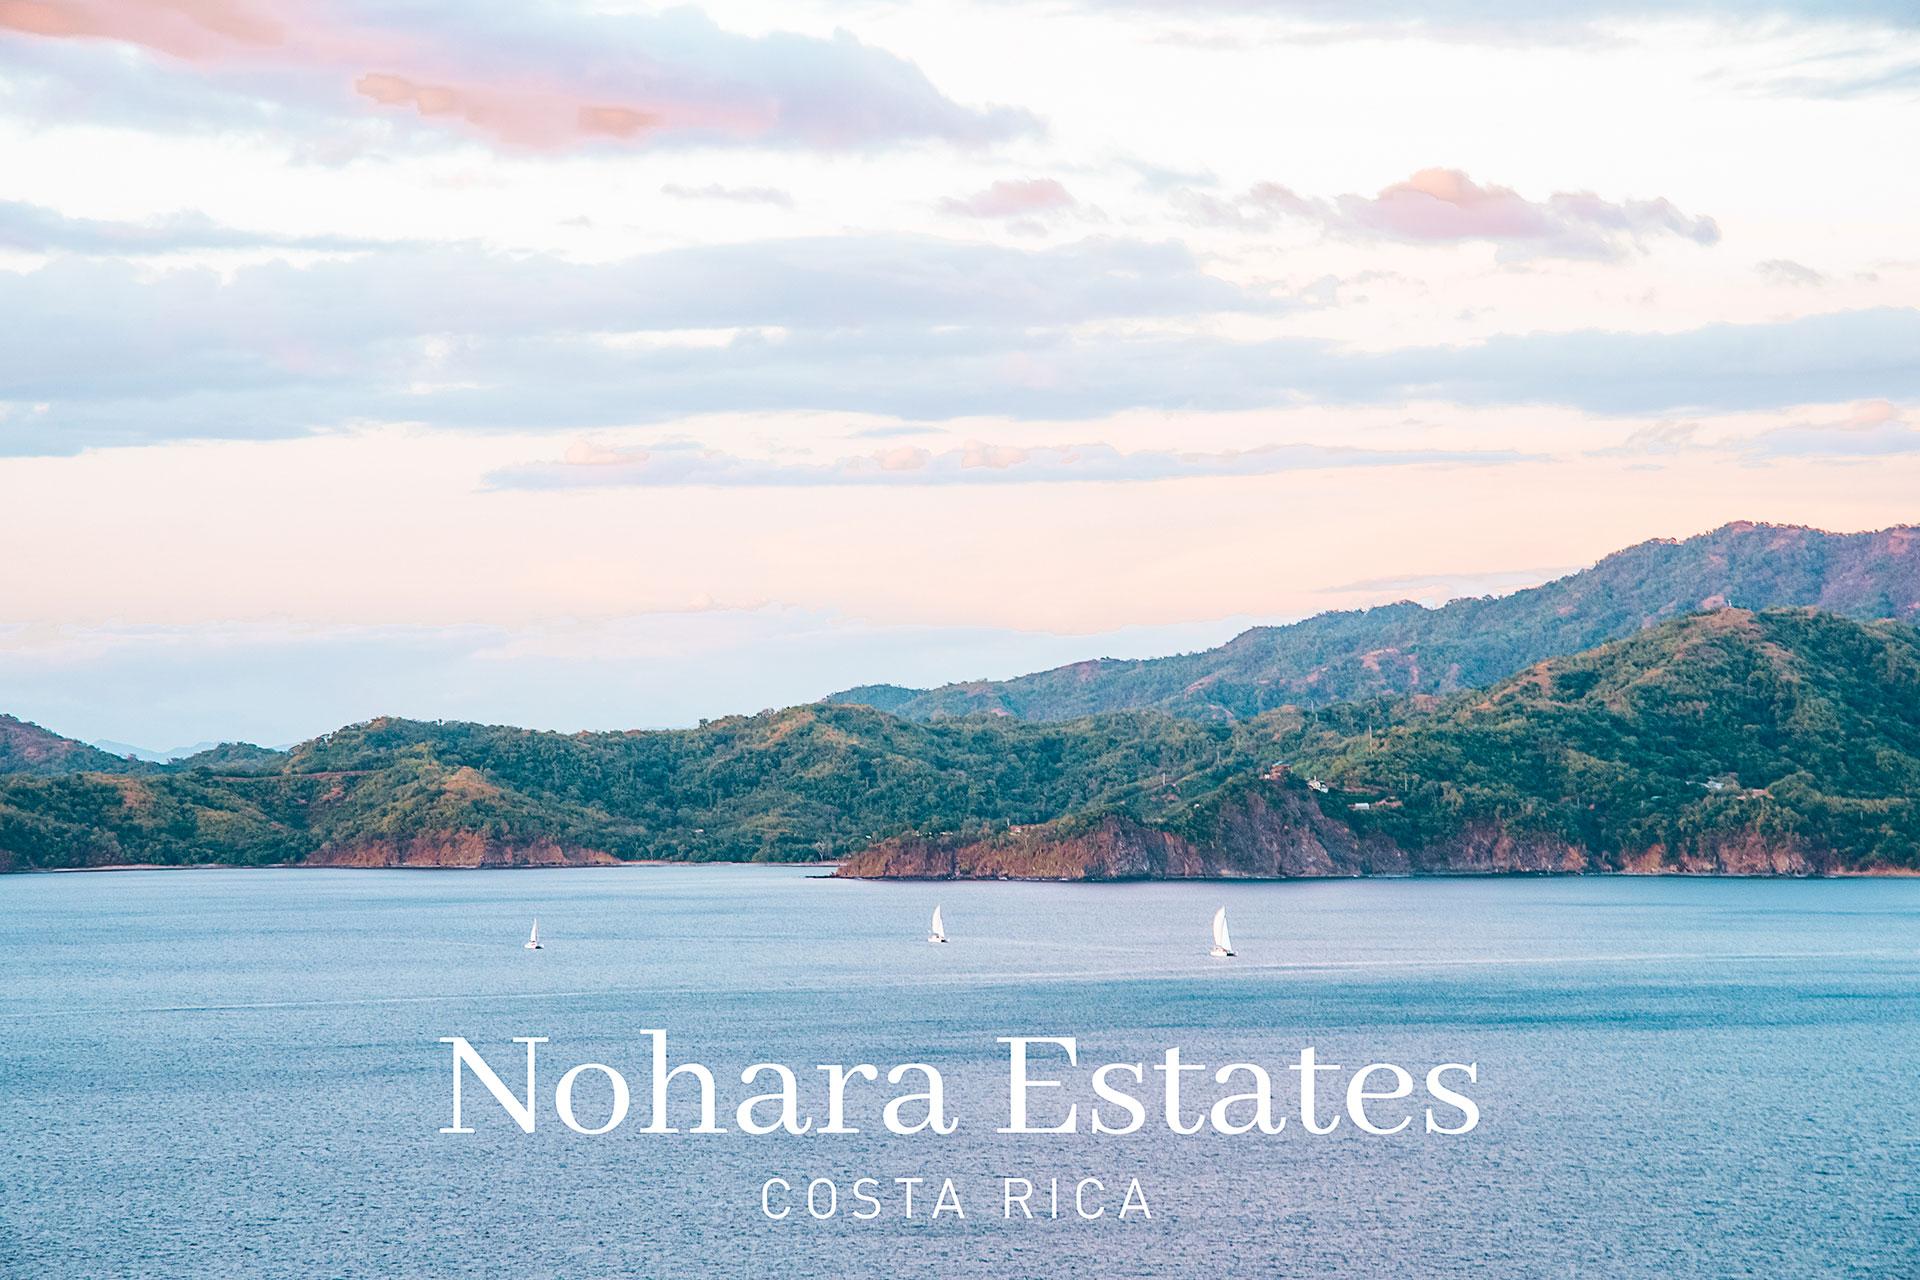 Nohara Estates Costa Rica 360 Esplendor Del Pacifico Area 29